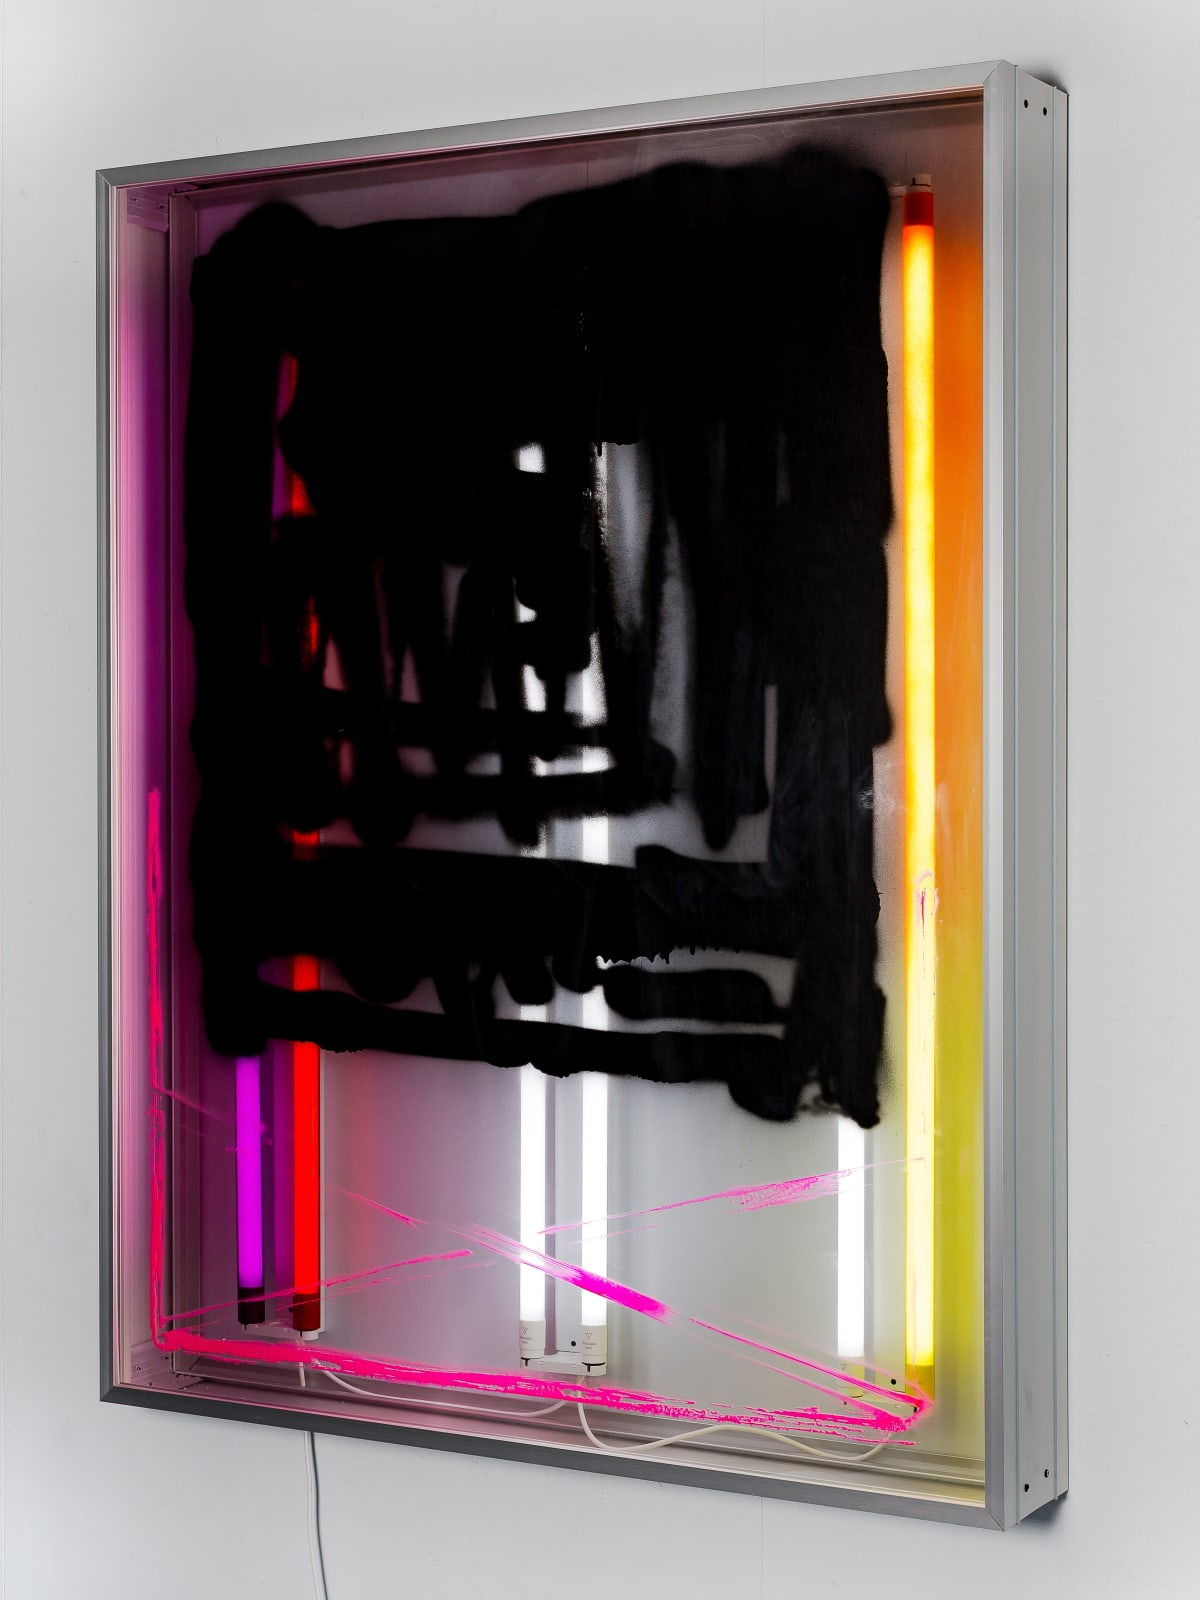 Thomas van Linge, (a) Untitled (Mirror Box), 2019